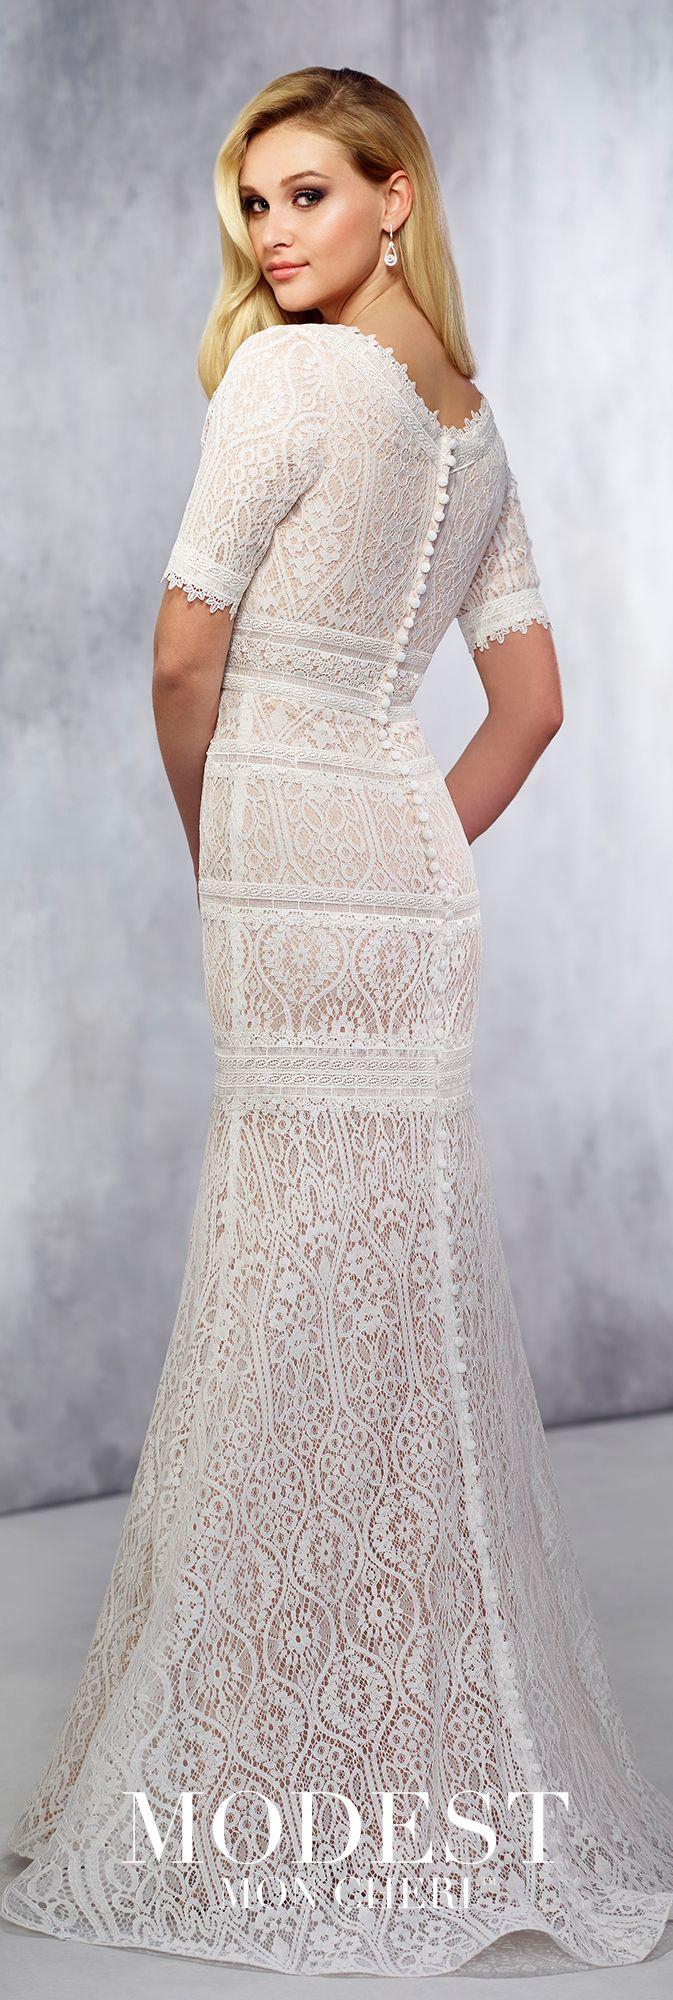 Lace Trumpet Wedding Gown - Modest by Mon Cheri TR21722   Modest ...